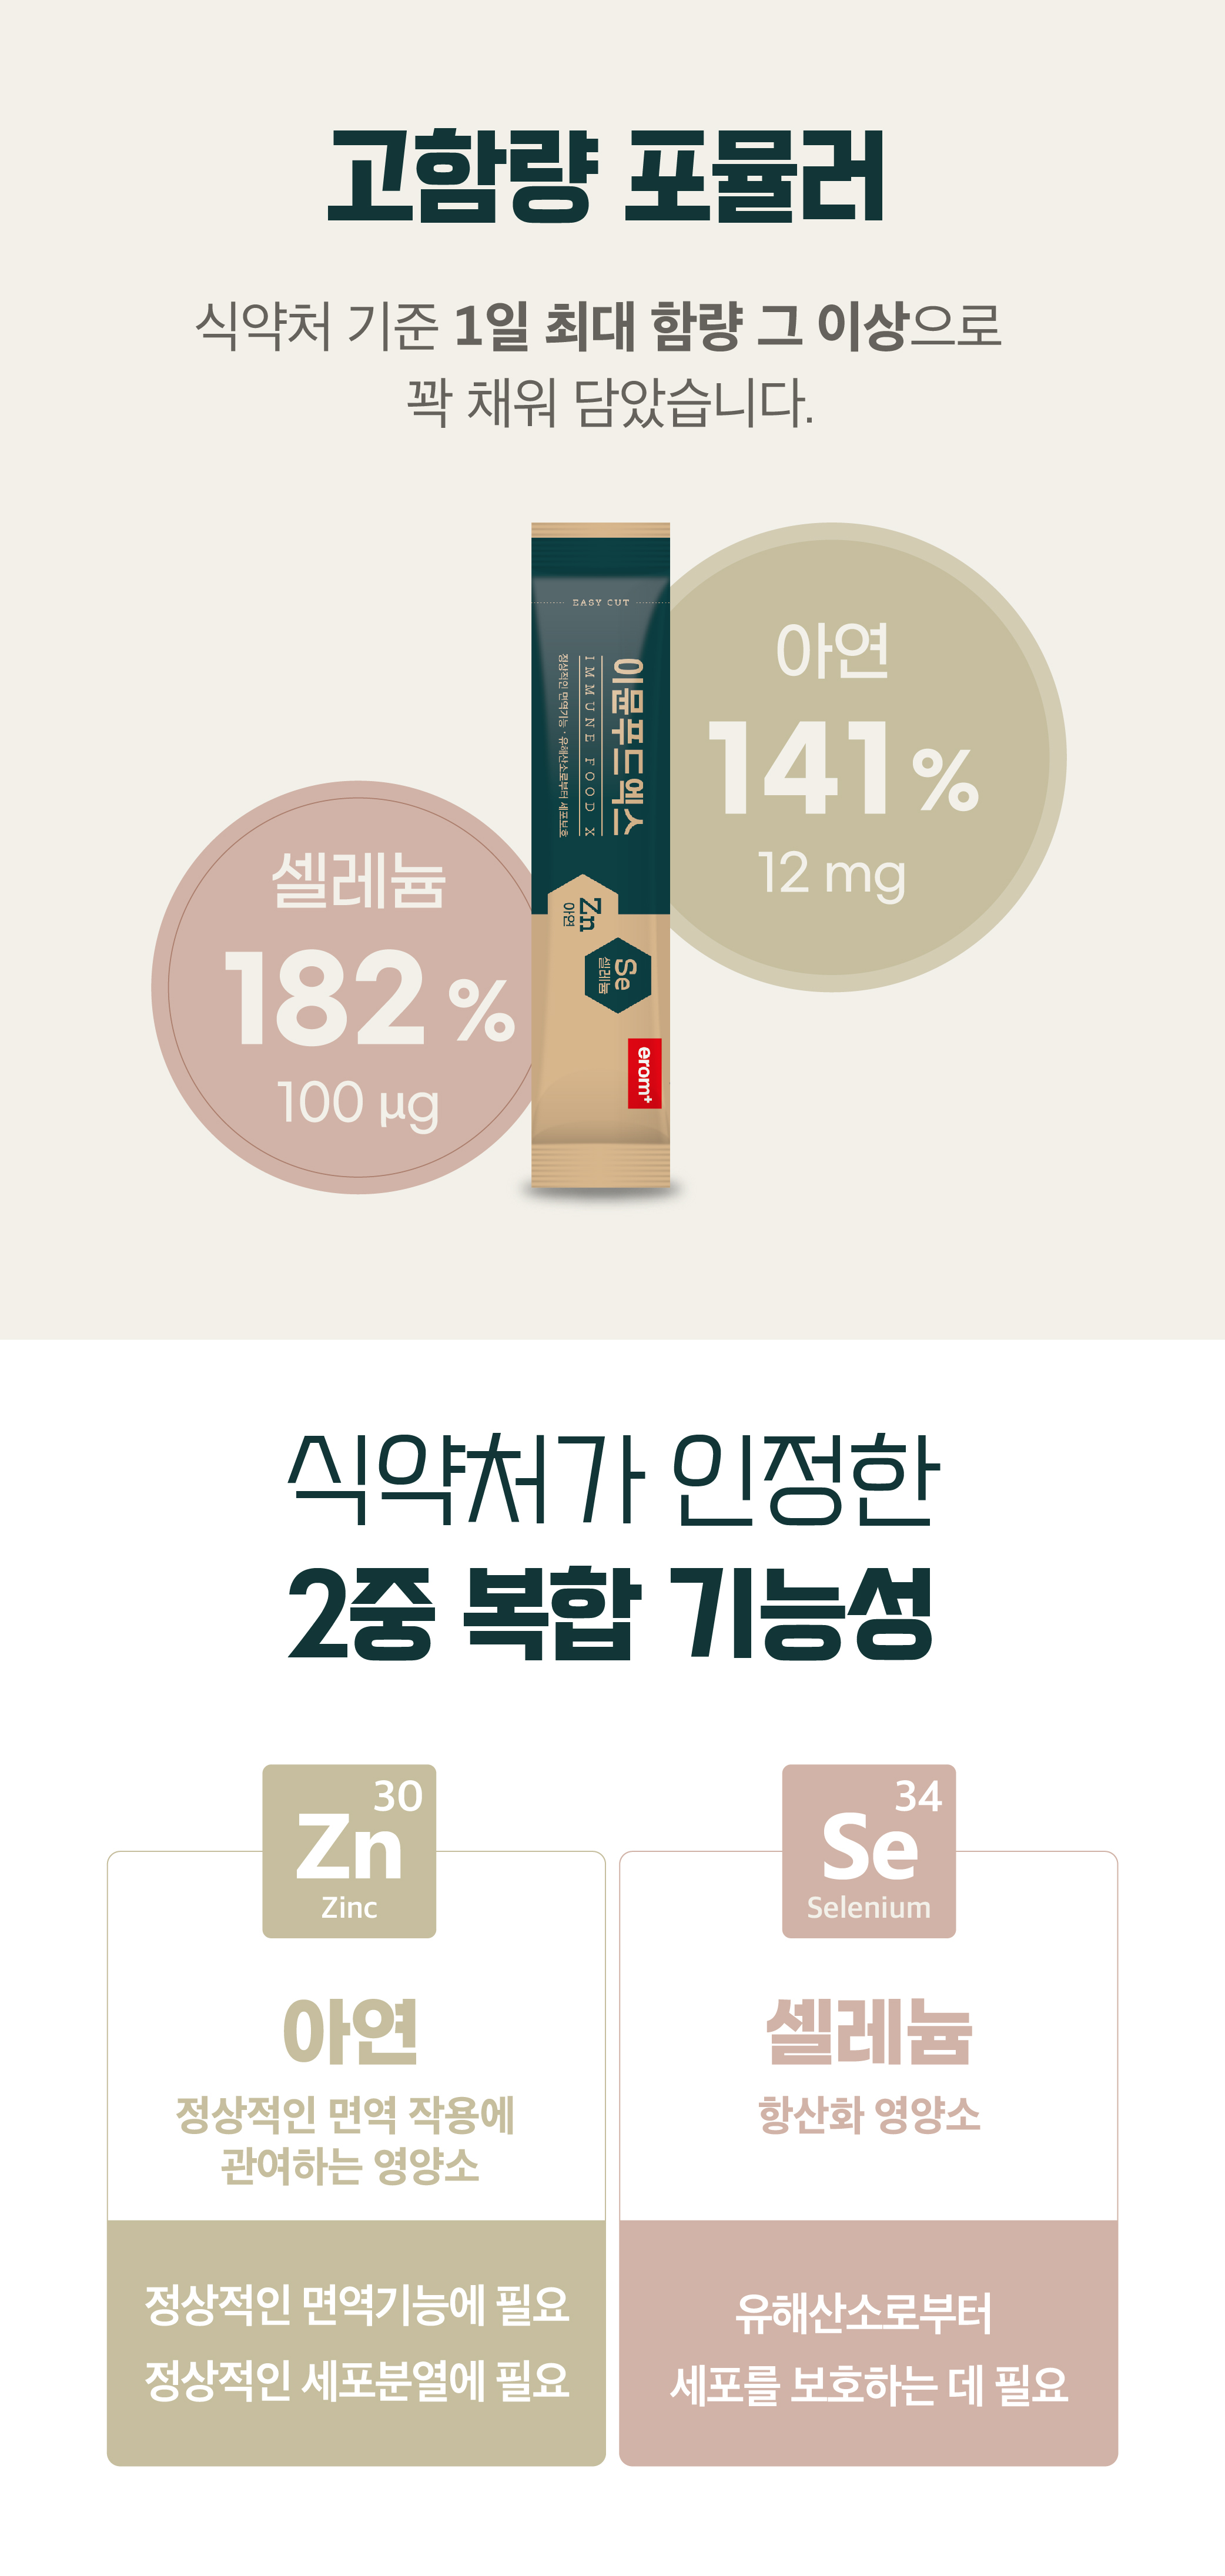 81_%EC%9D%B4%EB%AE%A8%ED%91%B8%EB%93%9C%EC%97%91%EC%8A%A4_2.jpg